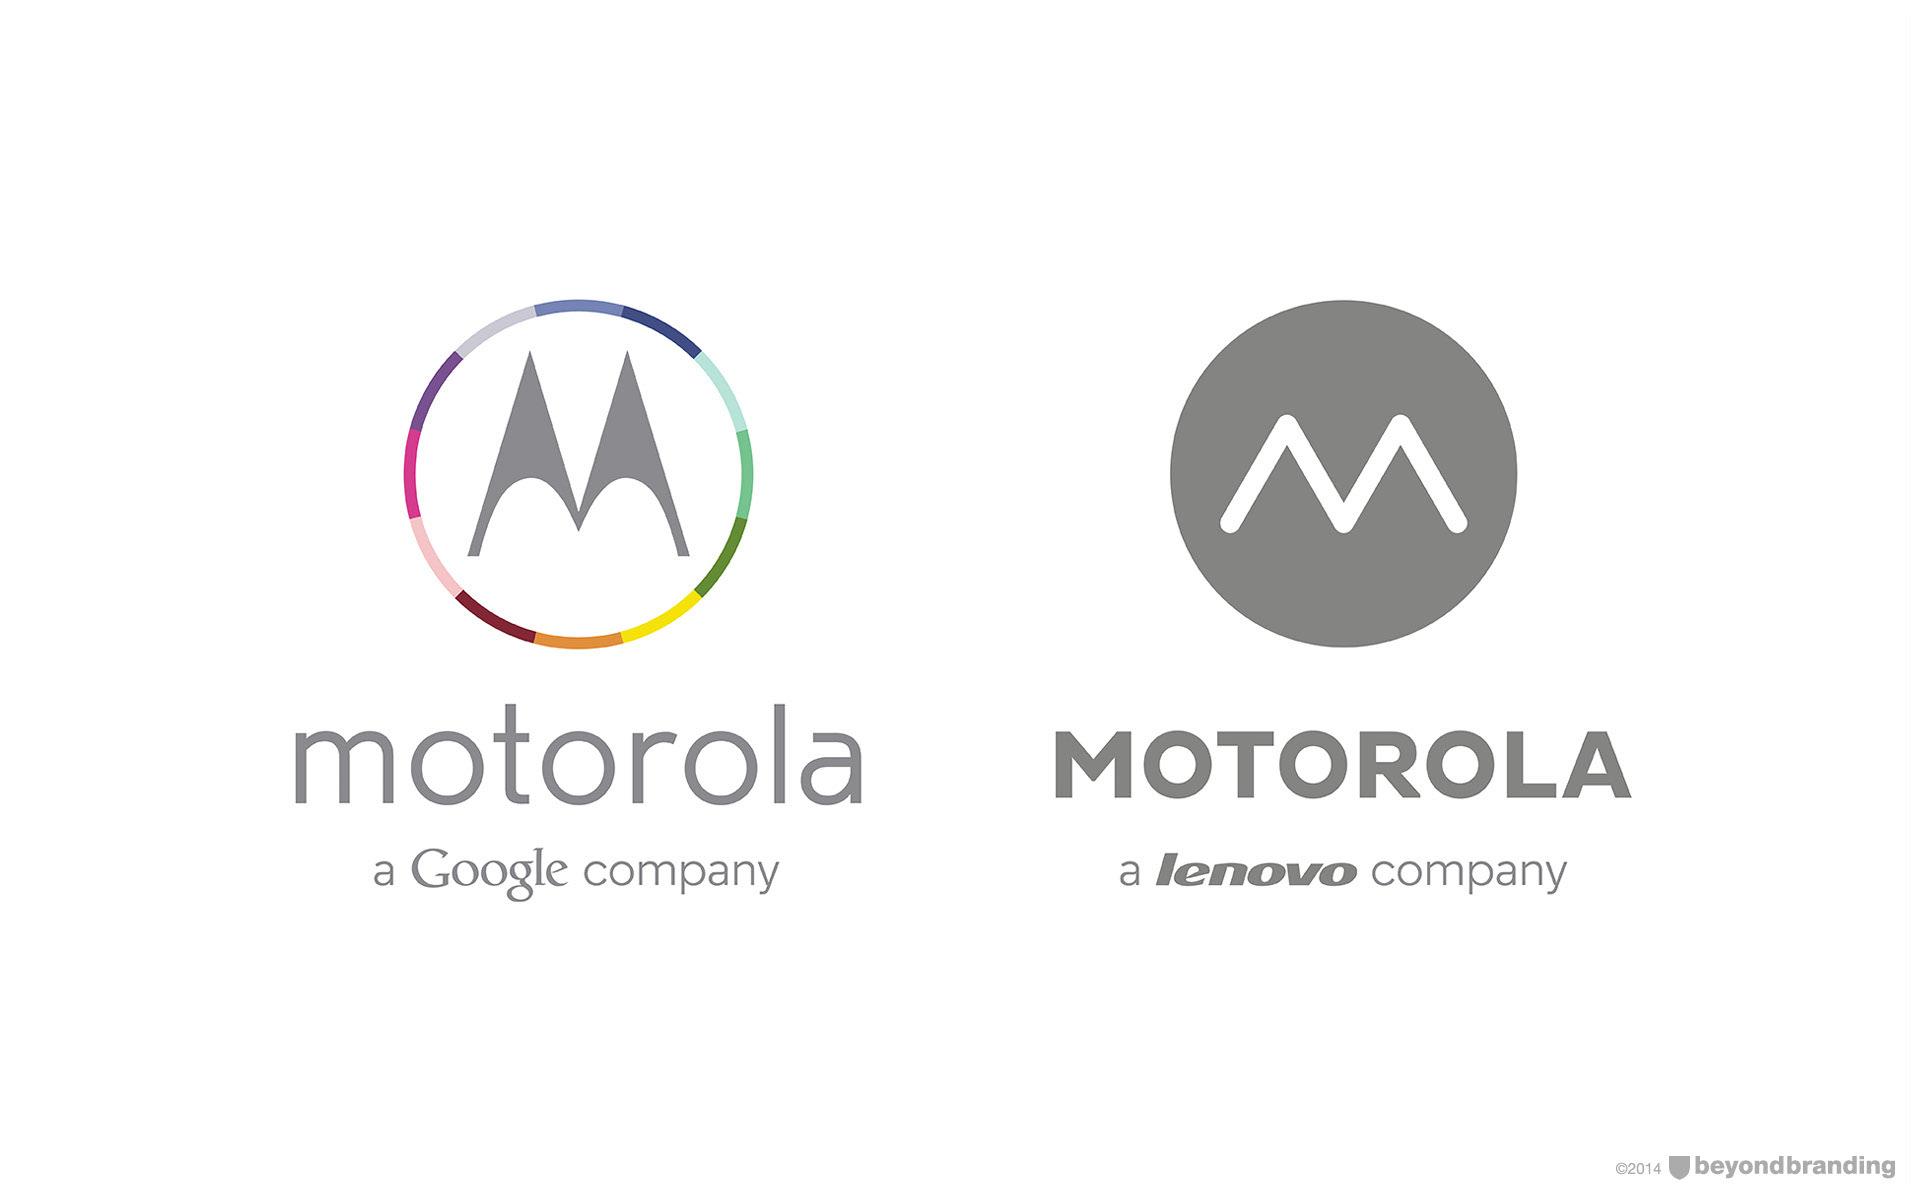 motorola logo white. old logo, new logo motorola white